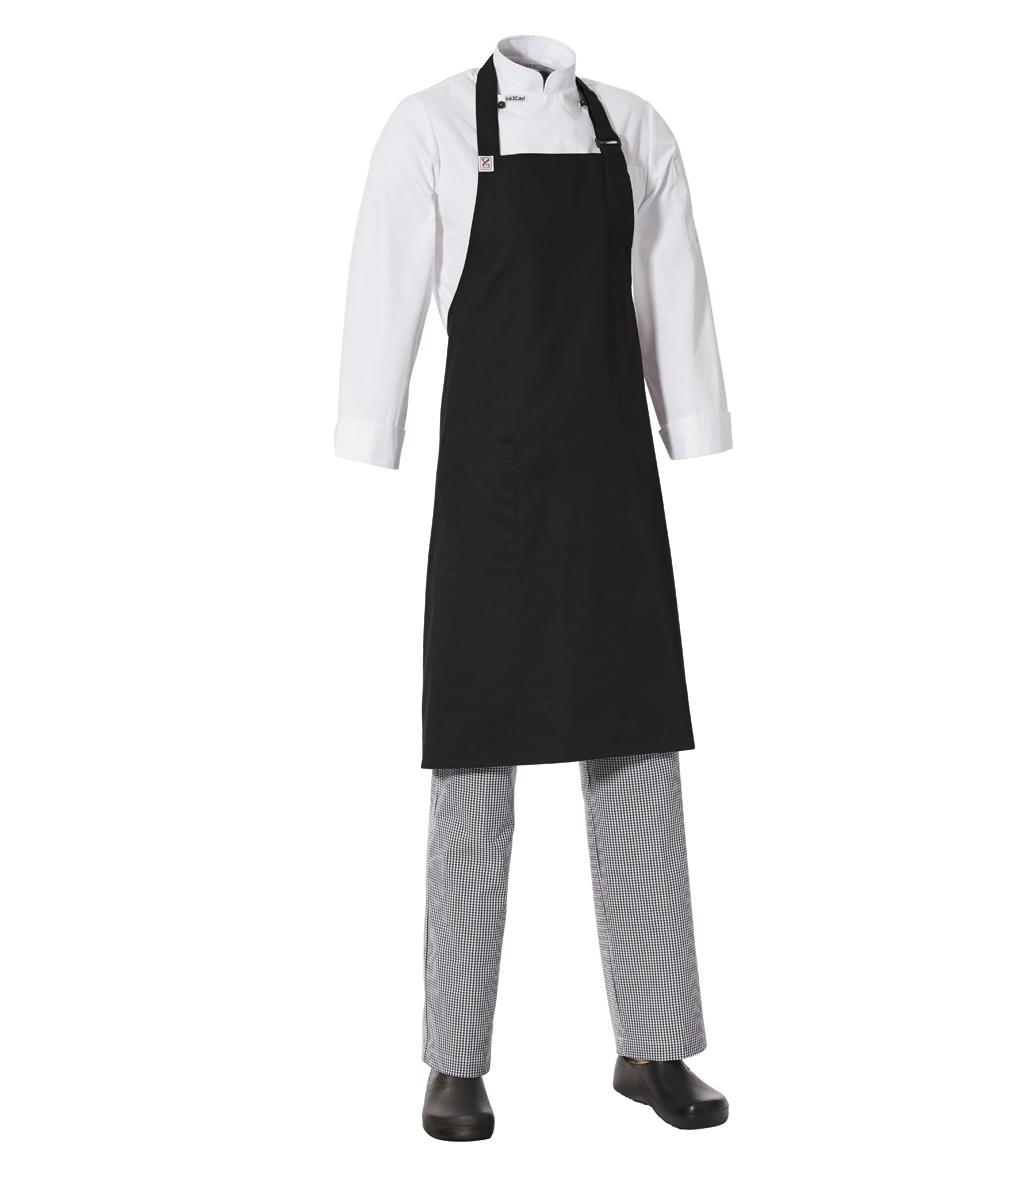 Bib Apron with Side Pocket by Club Chef Aprons 6